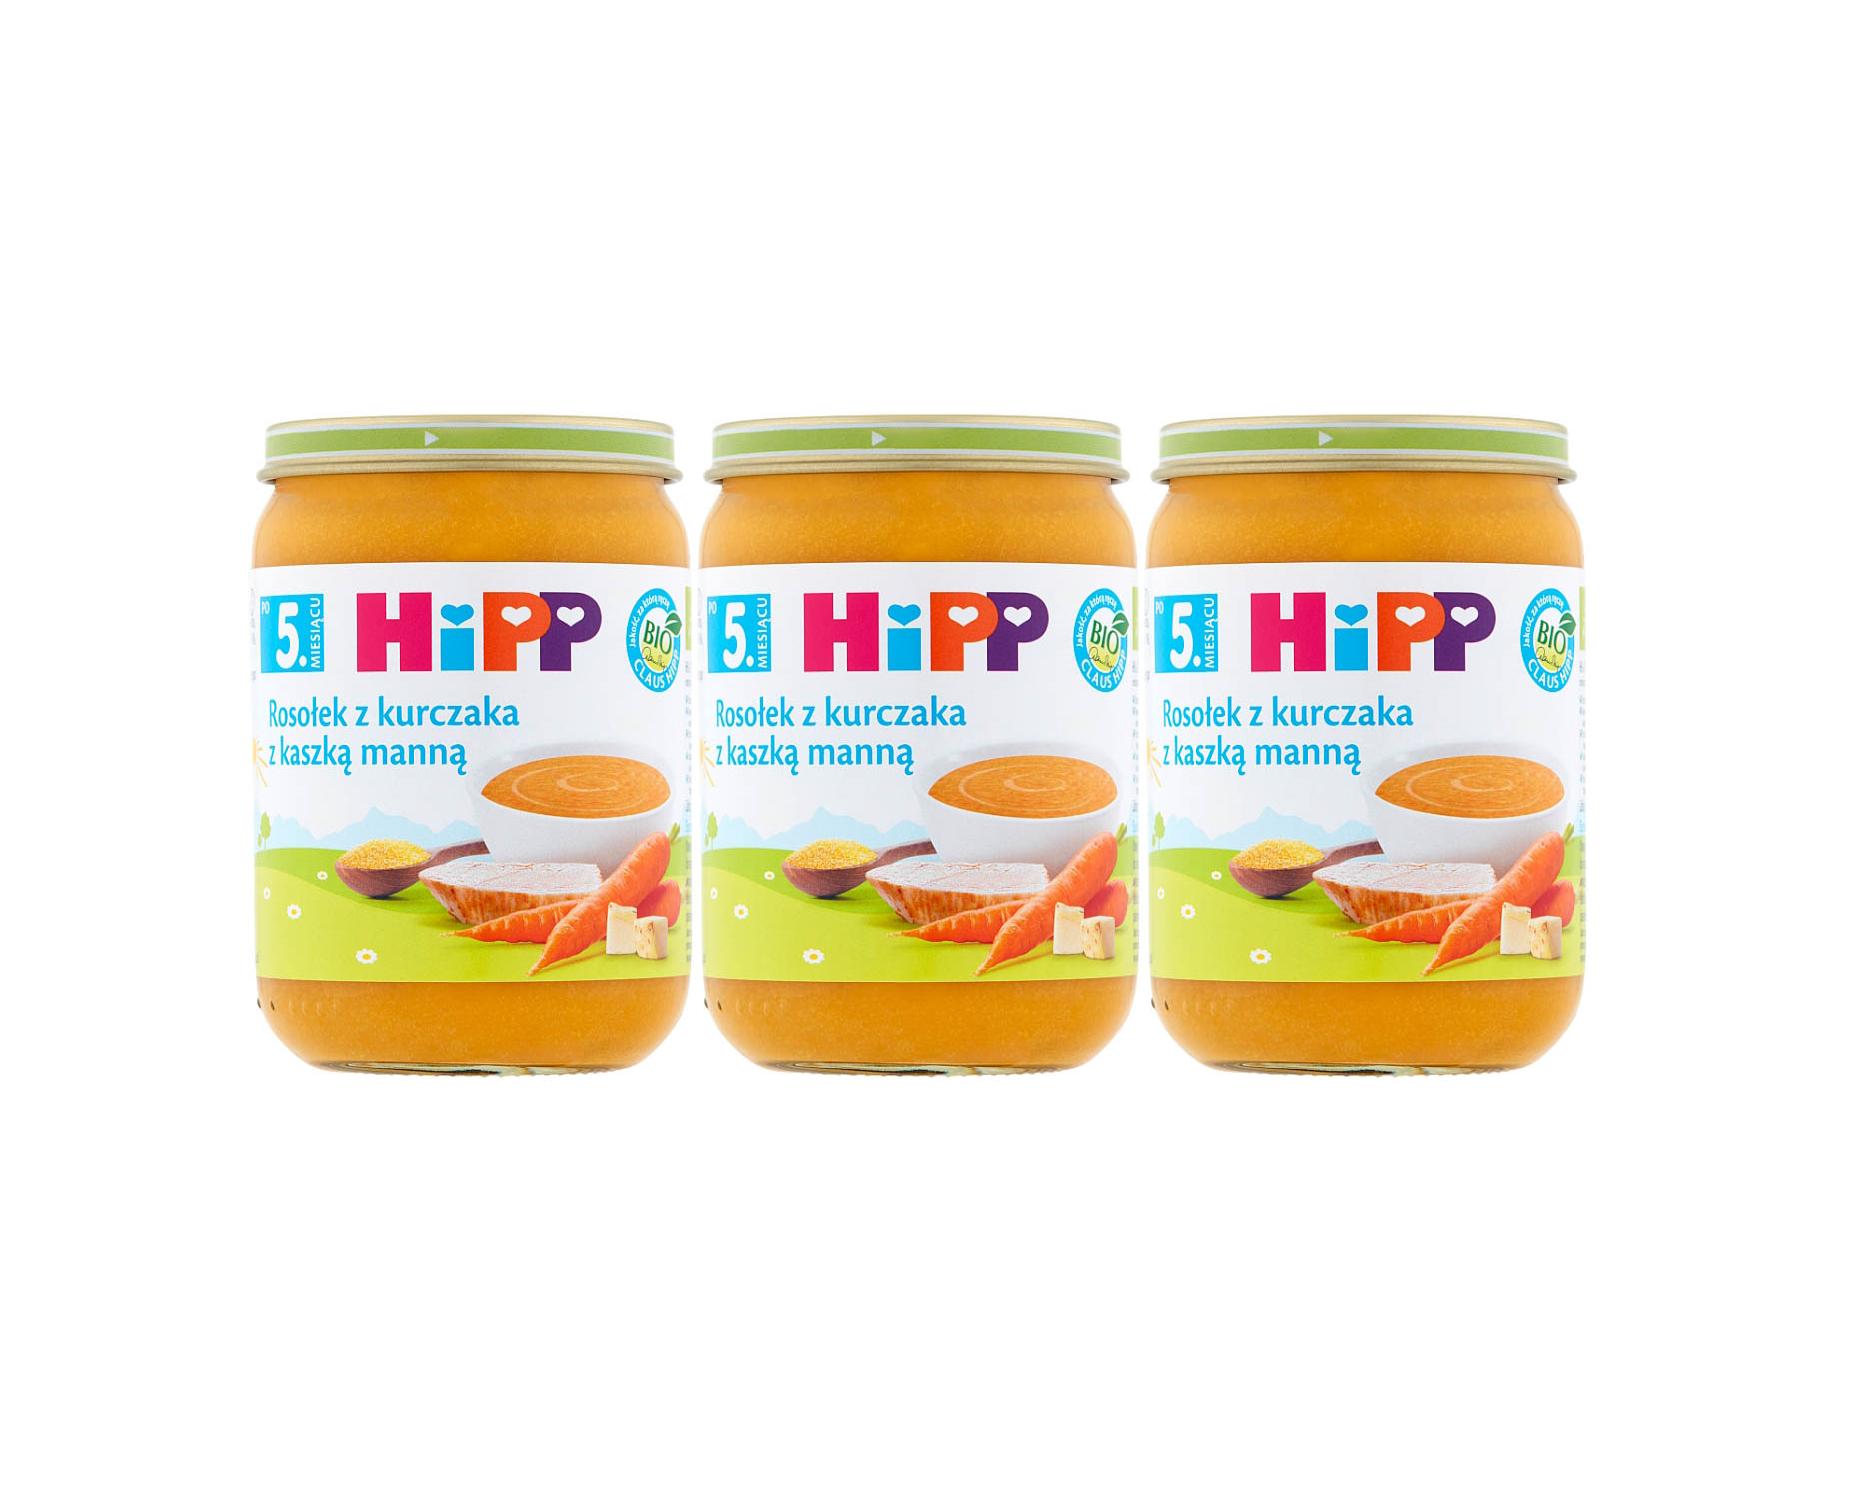 3 pak hipp 190 rosolek z kurczakiem i kaszka manna